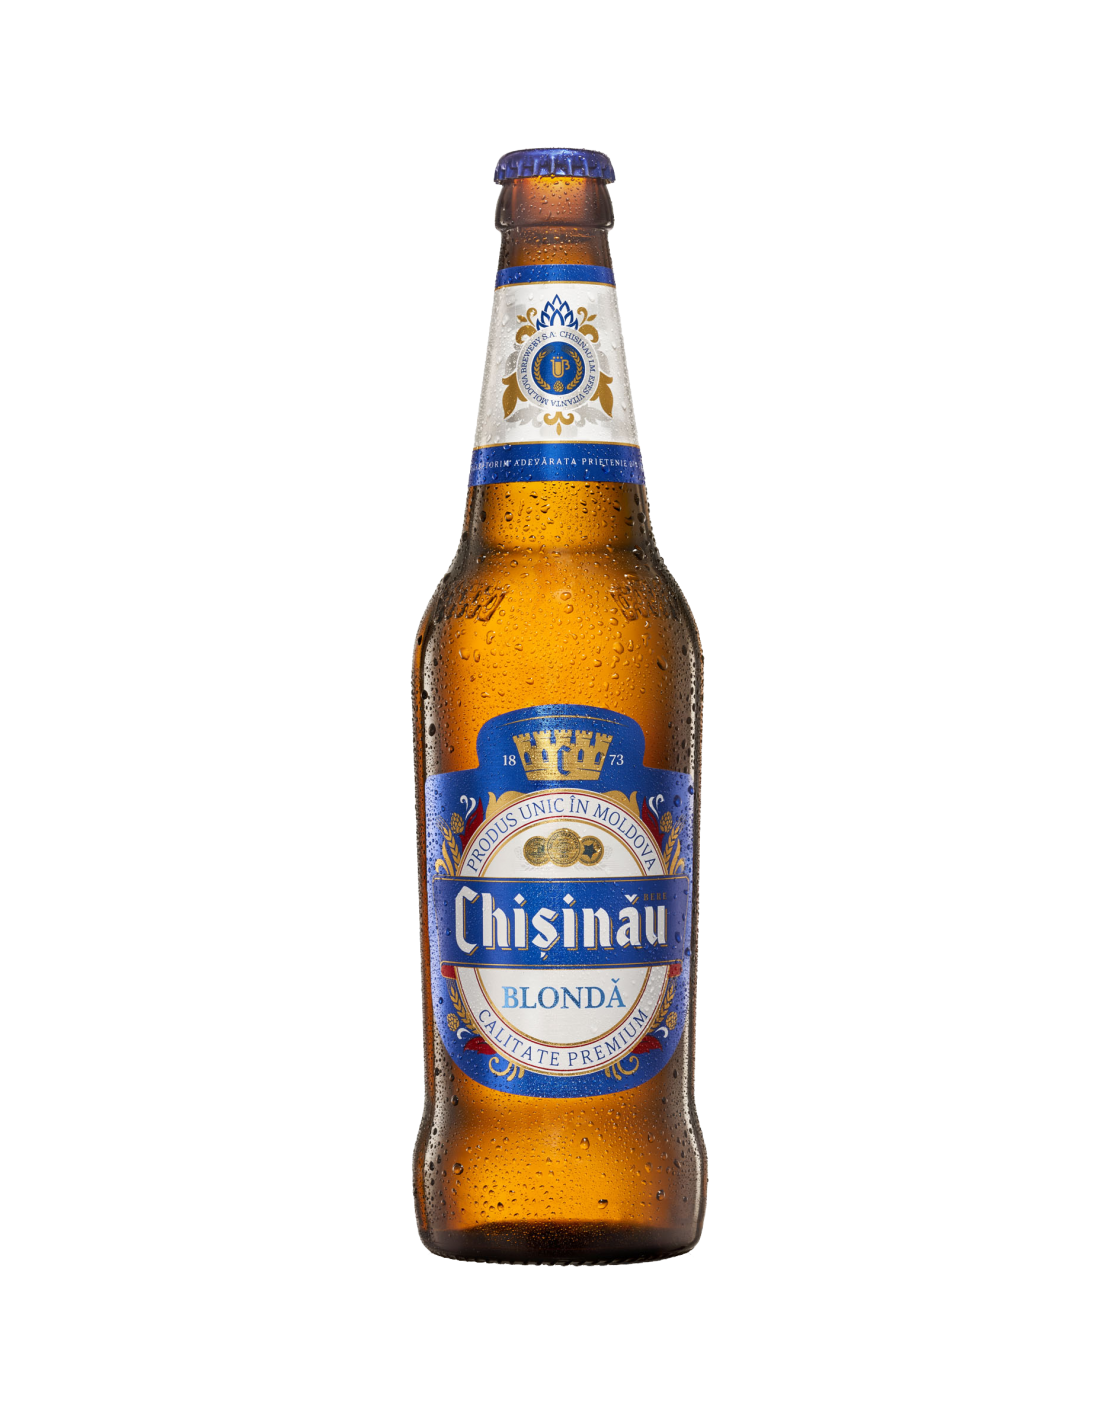 Bere blonda, Chisinau Calitate Premium, 4.5% alc., 0.5L, Moldova